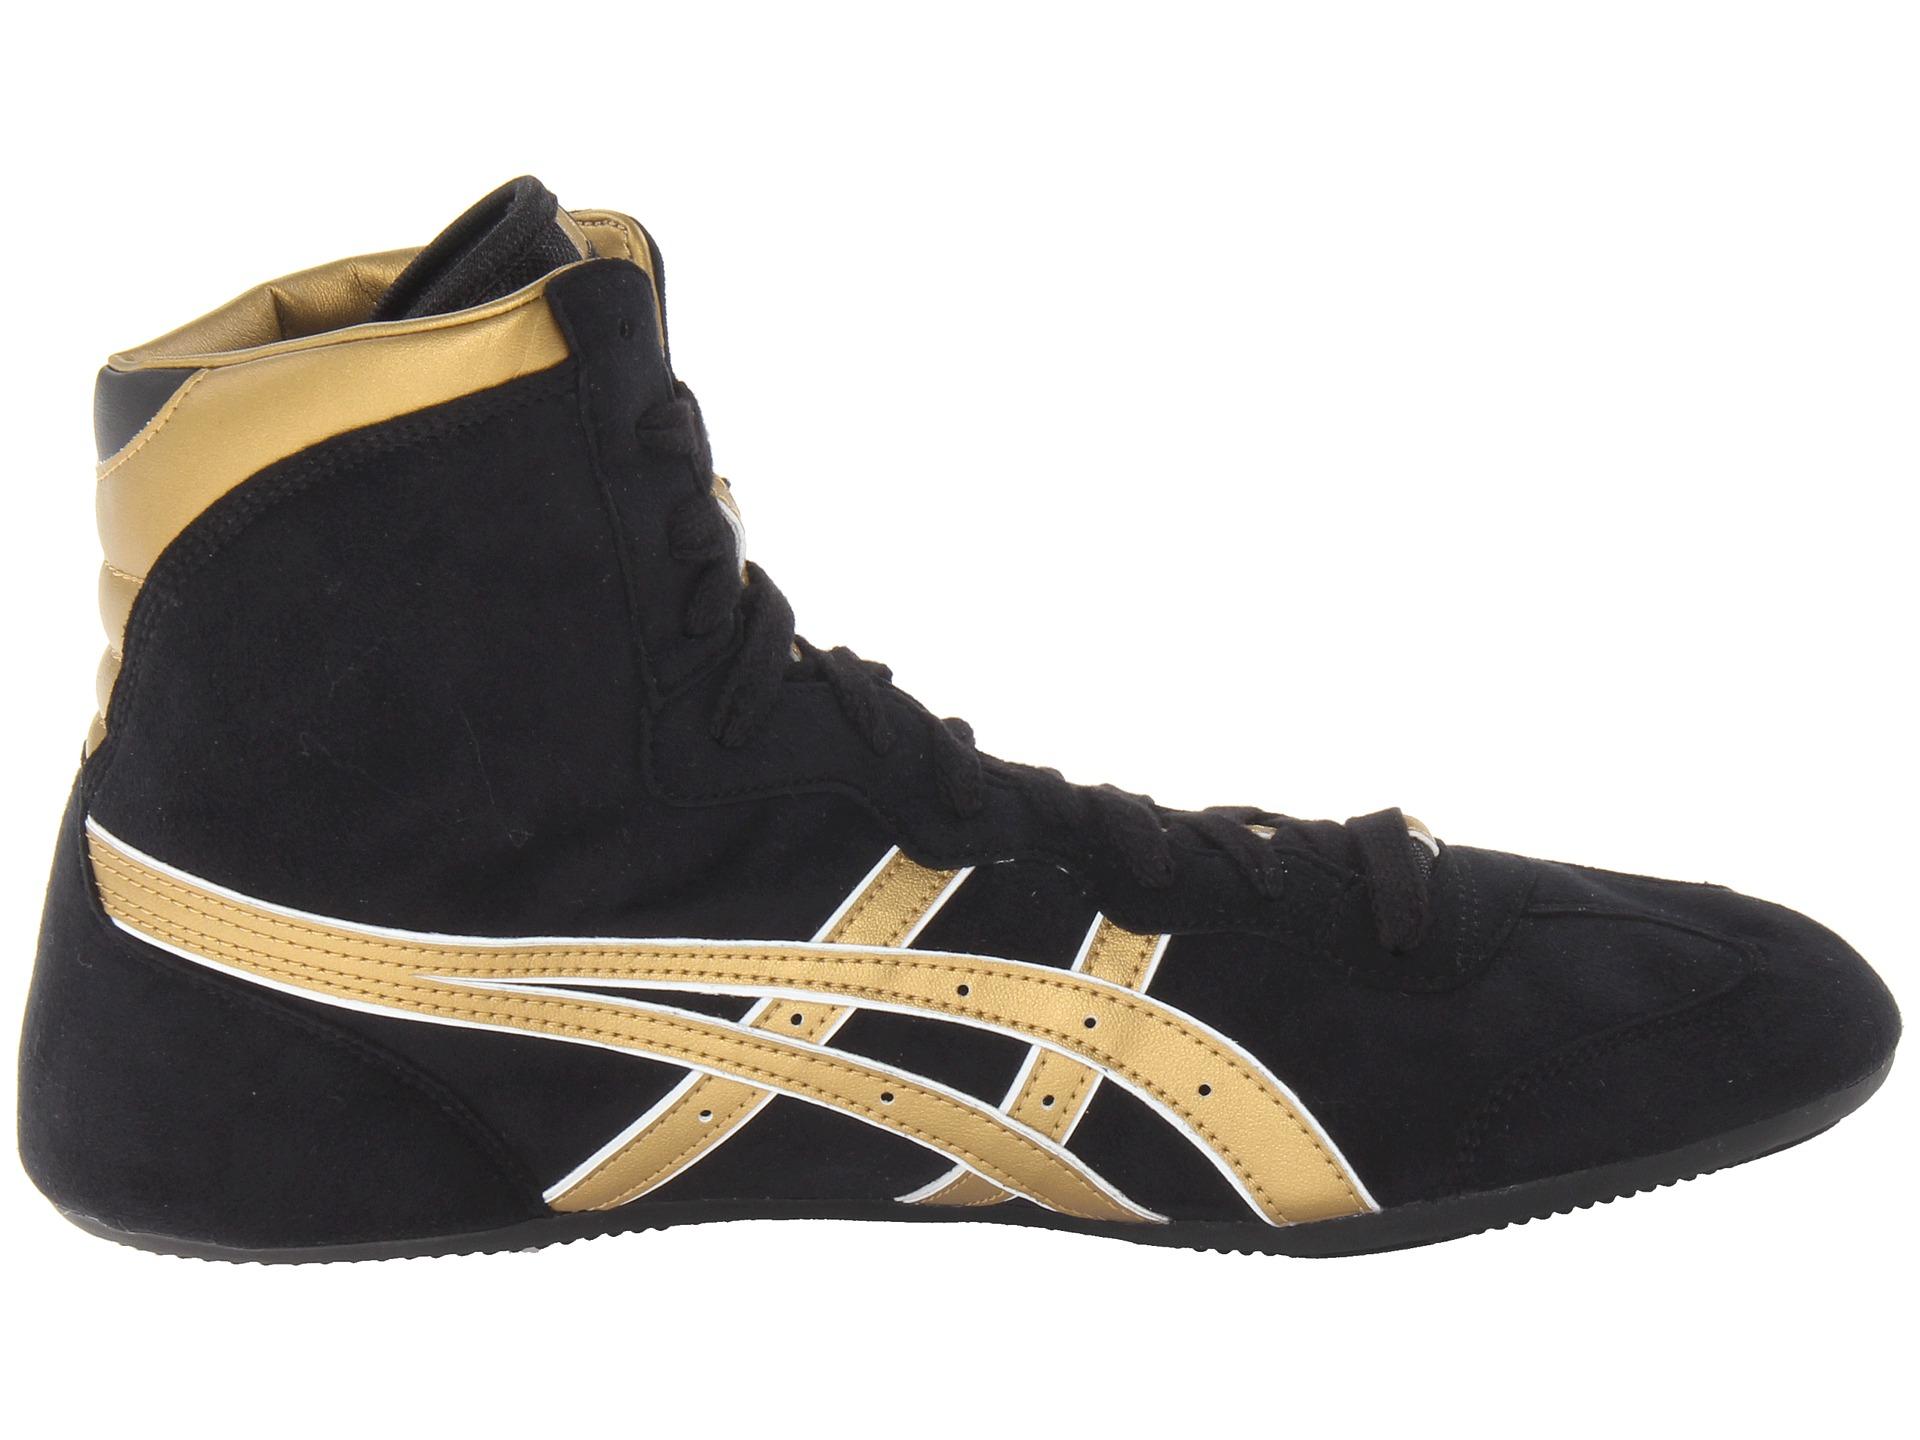 Asics Men S Dave Schultz Classic Wrestling Shoe Size